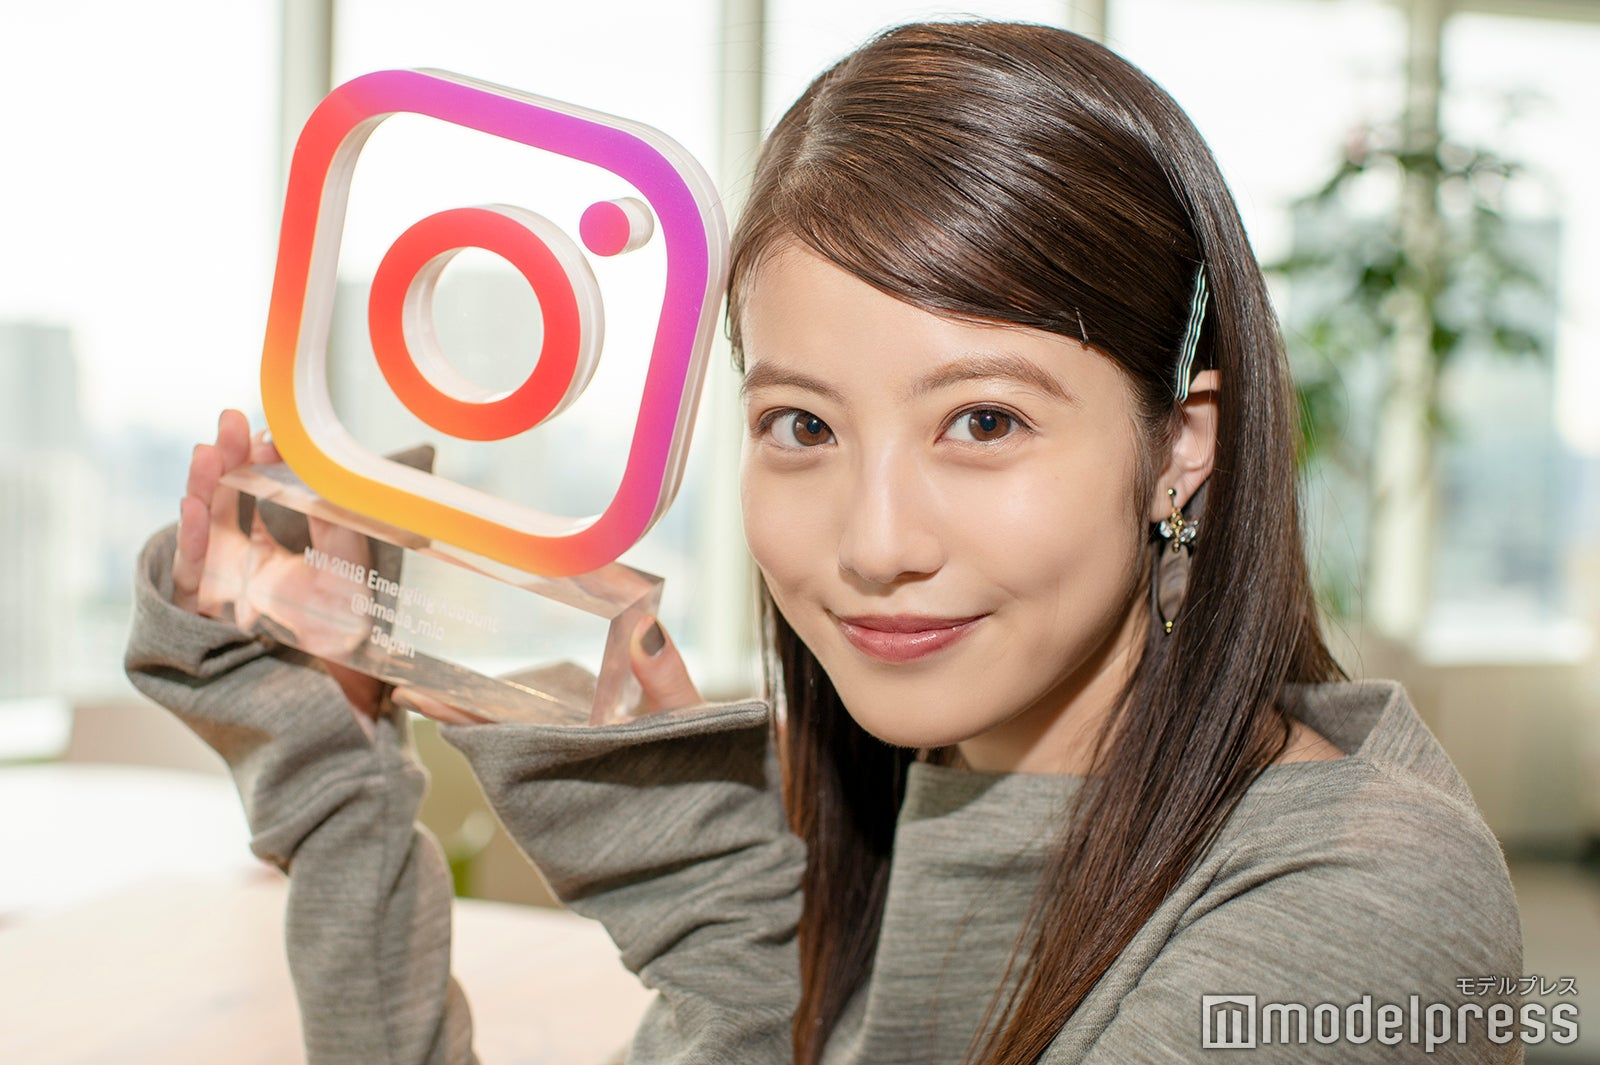 美桜 instagram 今田